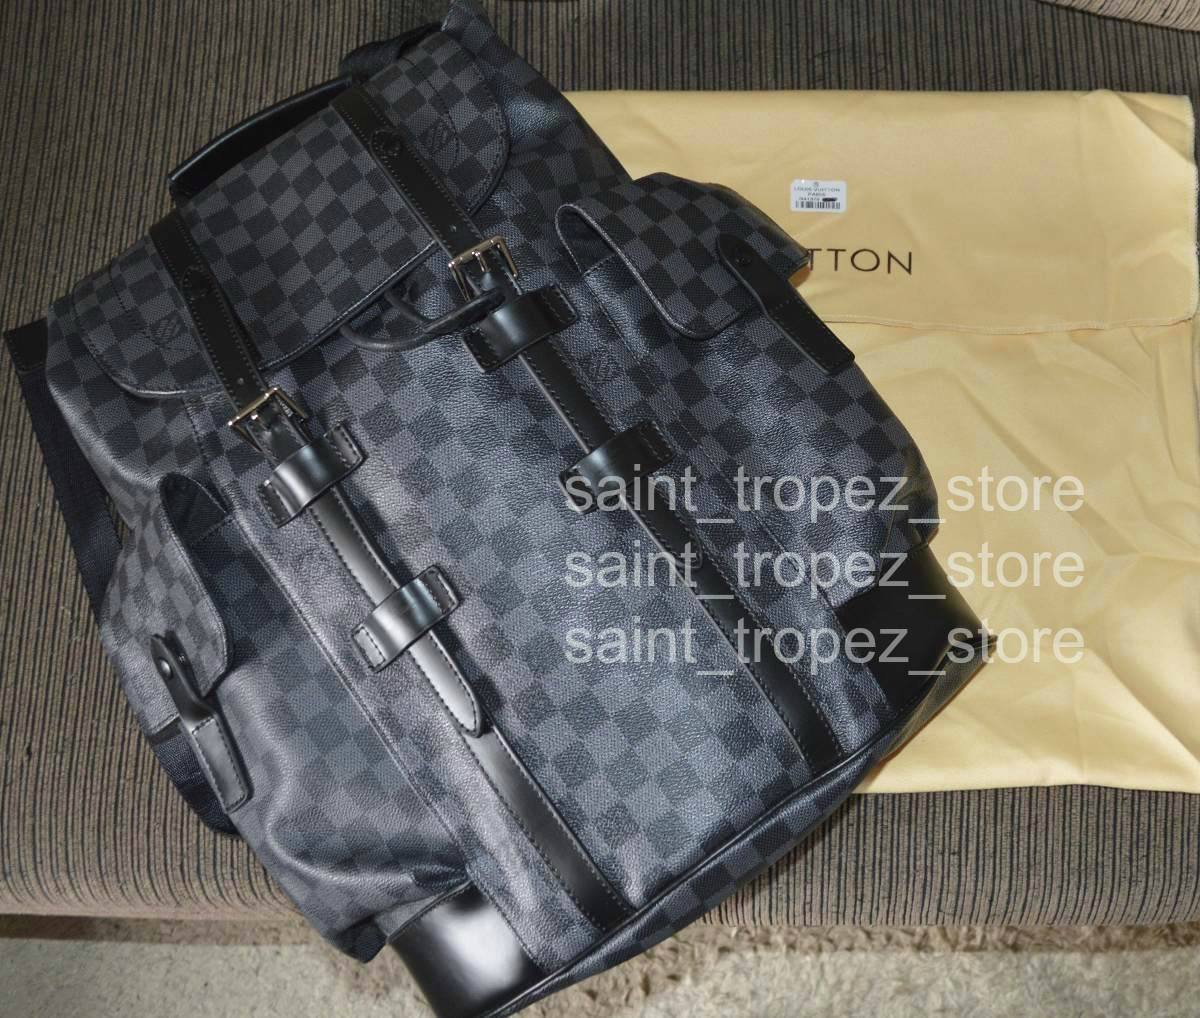 b98e4e8ddcdf Mochila  Bolsa Louis Vuitton Christopher Pm N41379 - R  5.000